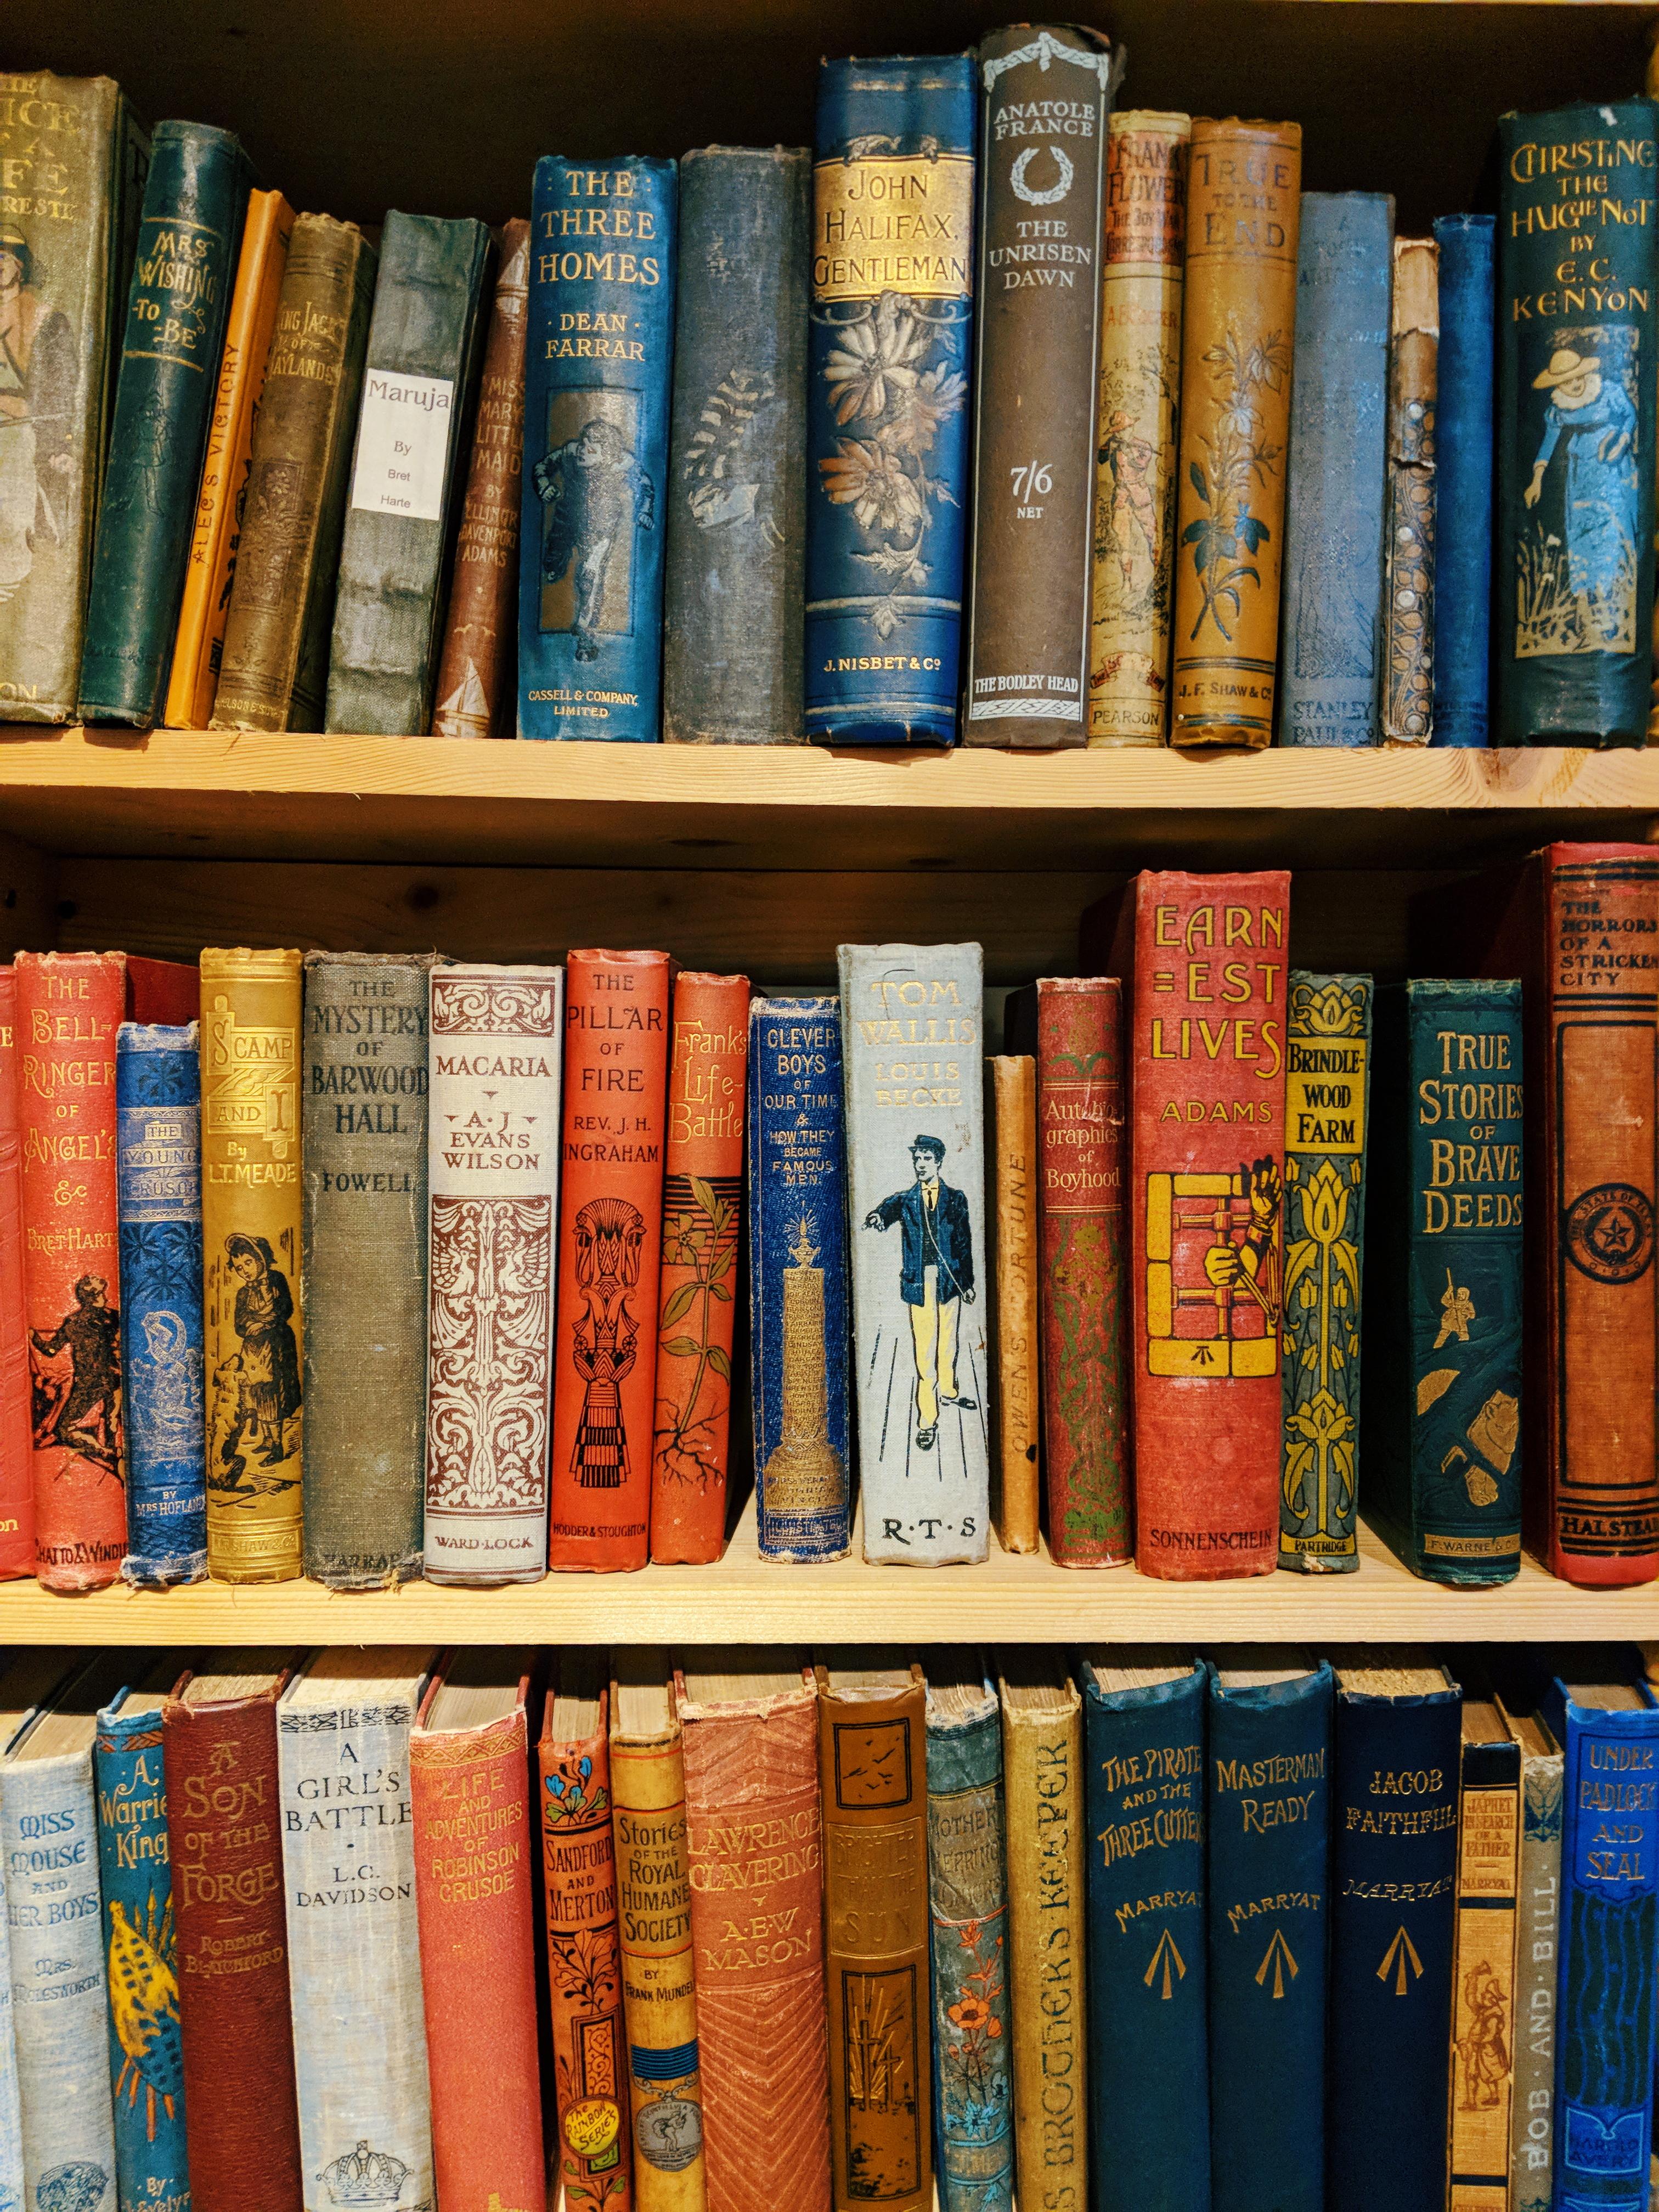 A bookshelf of vintage children's books